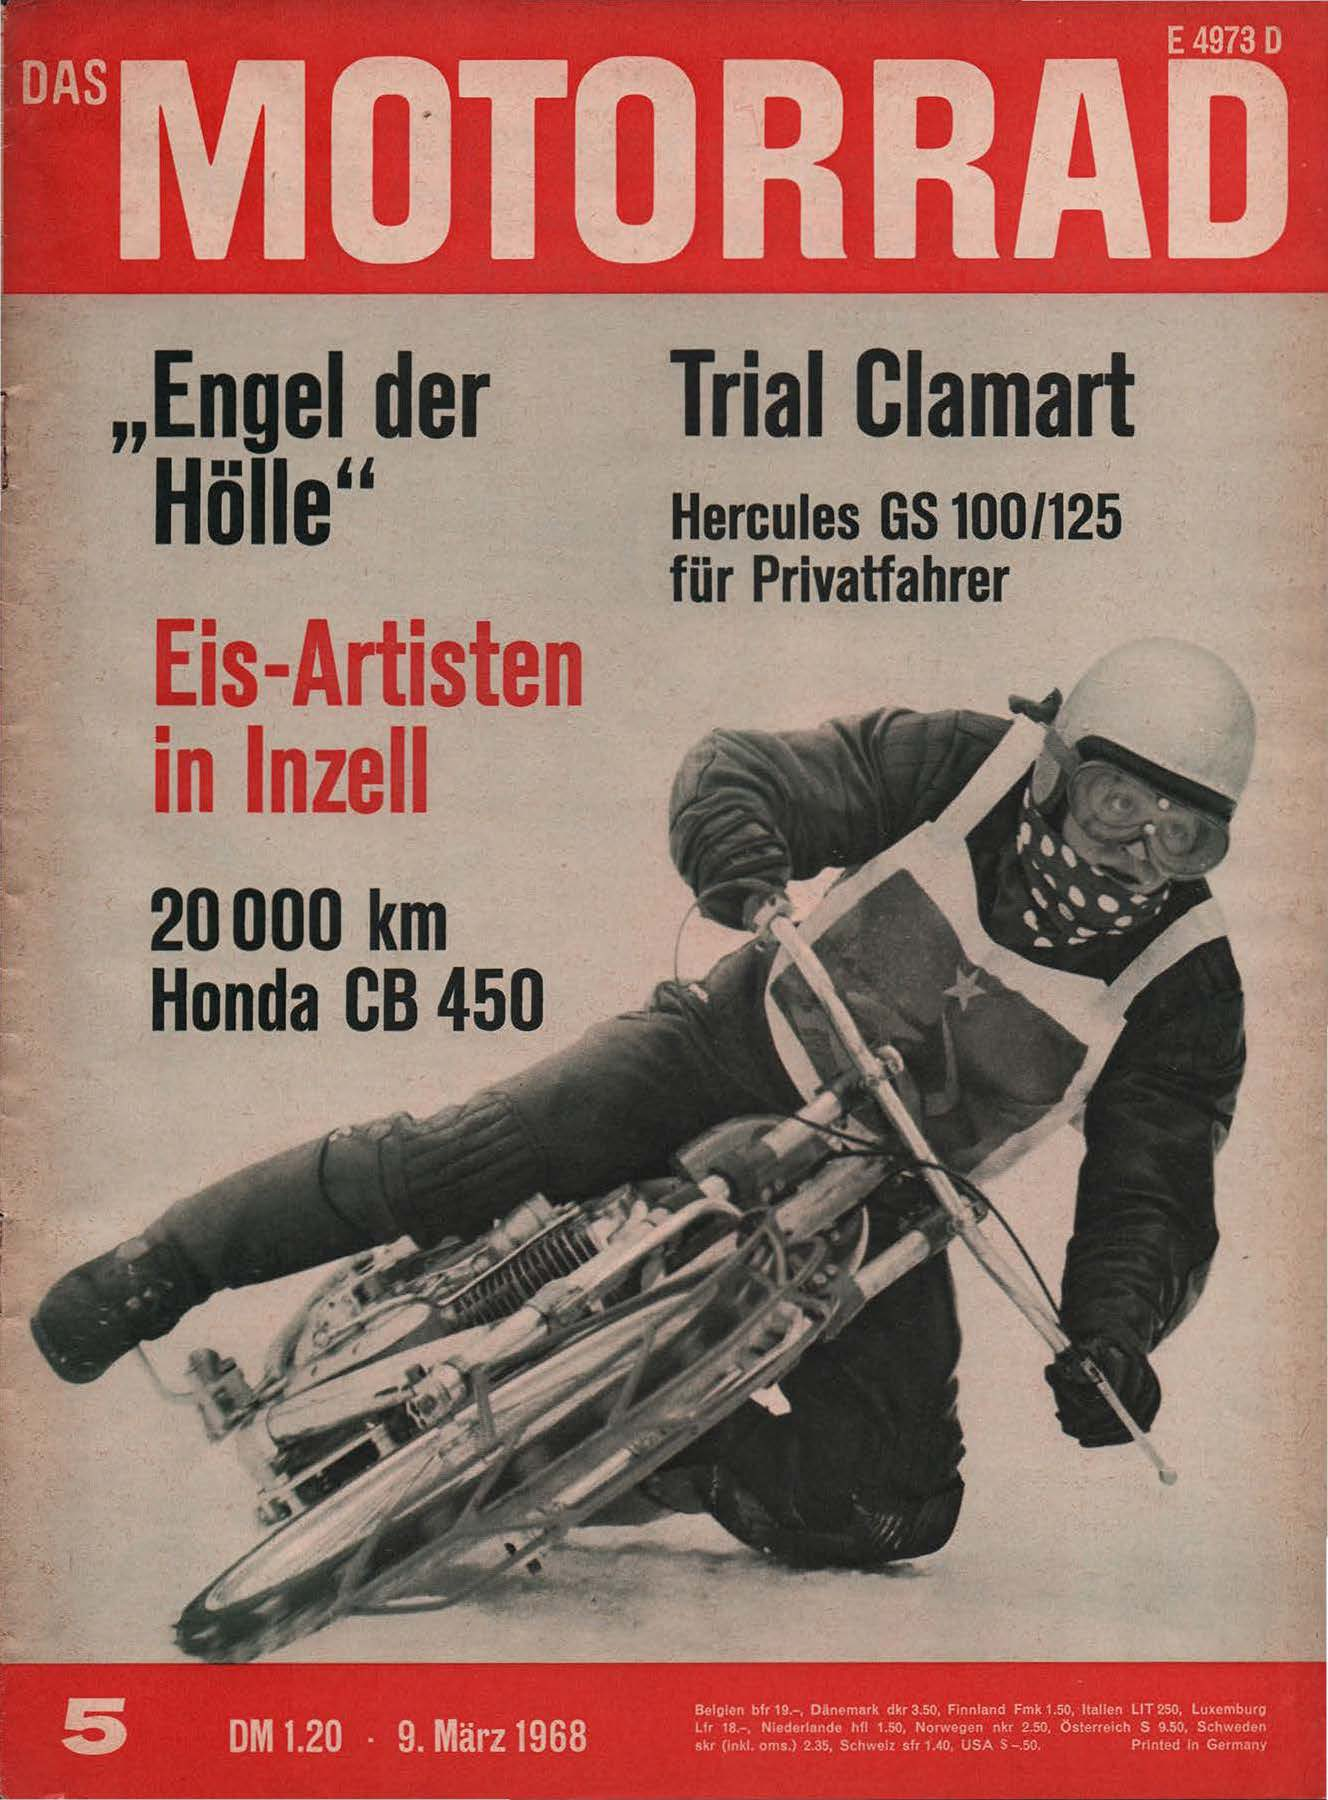 Das Motorrad, 9 March 1968, E4973D